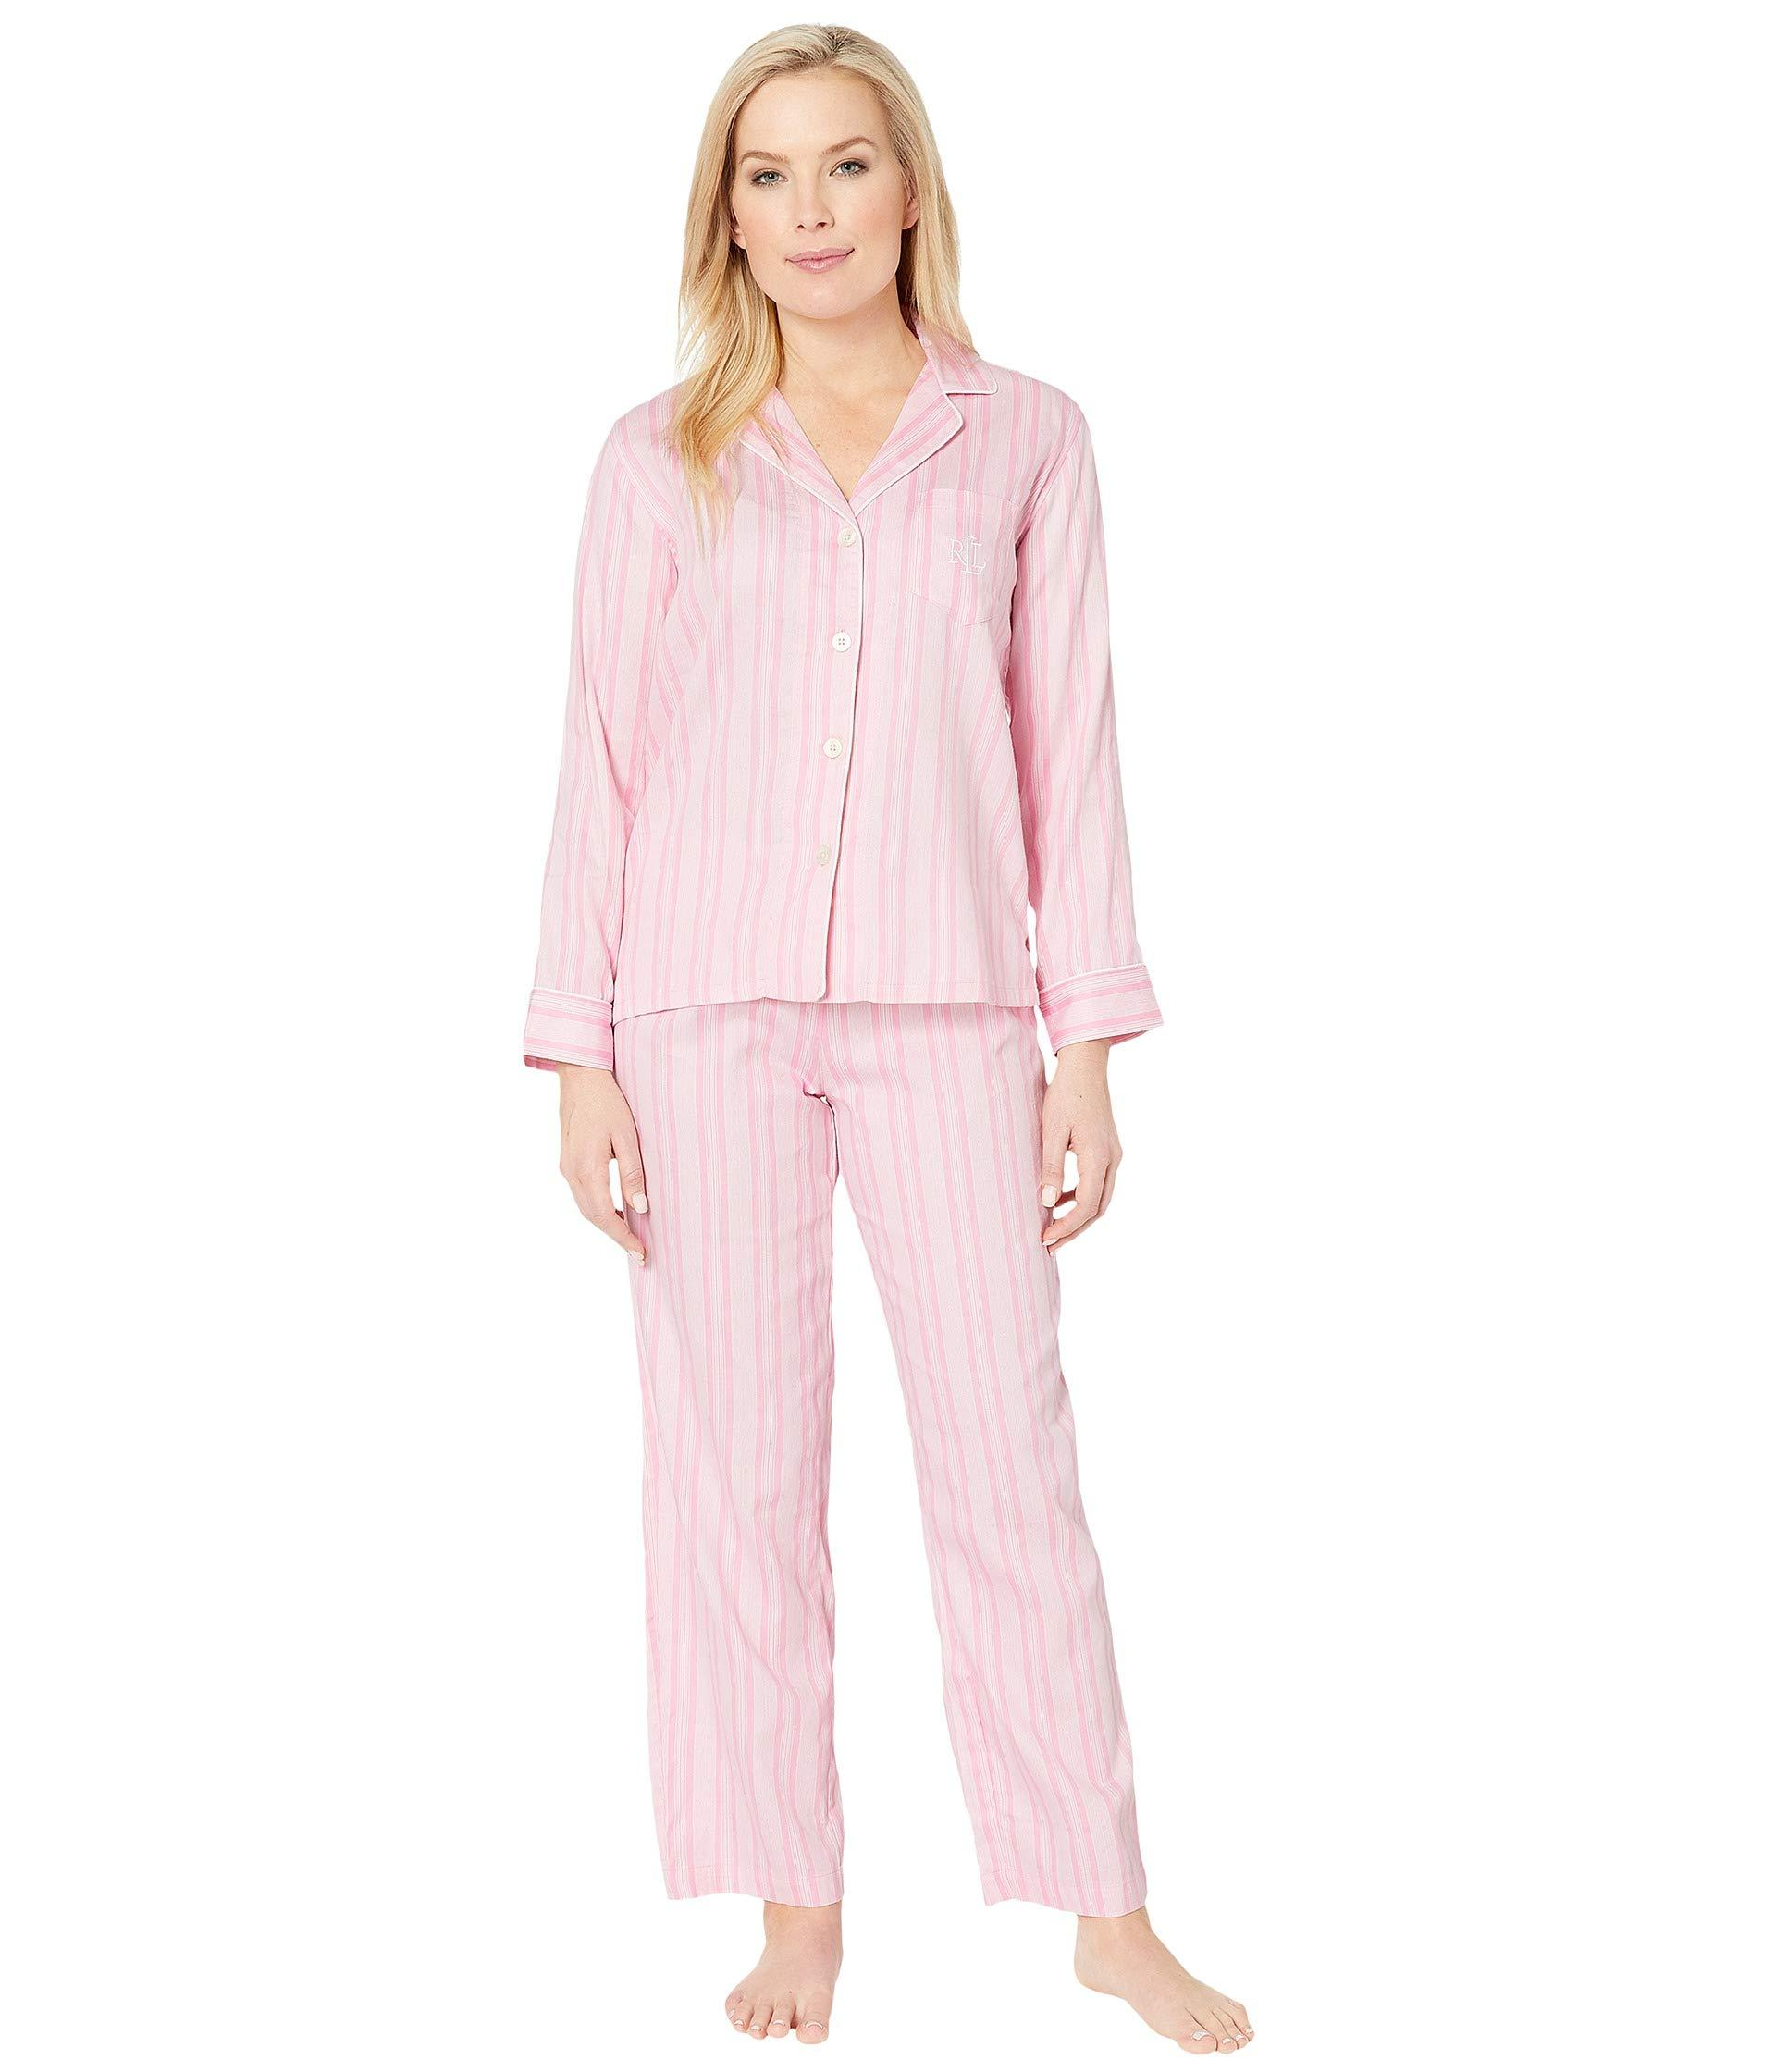 84d123764b5 Lauren by Ralph Lauren. Petite Pointed Notch Collar Pajama Set (pink ...